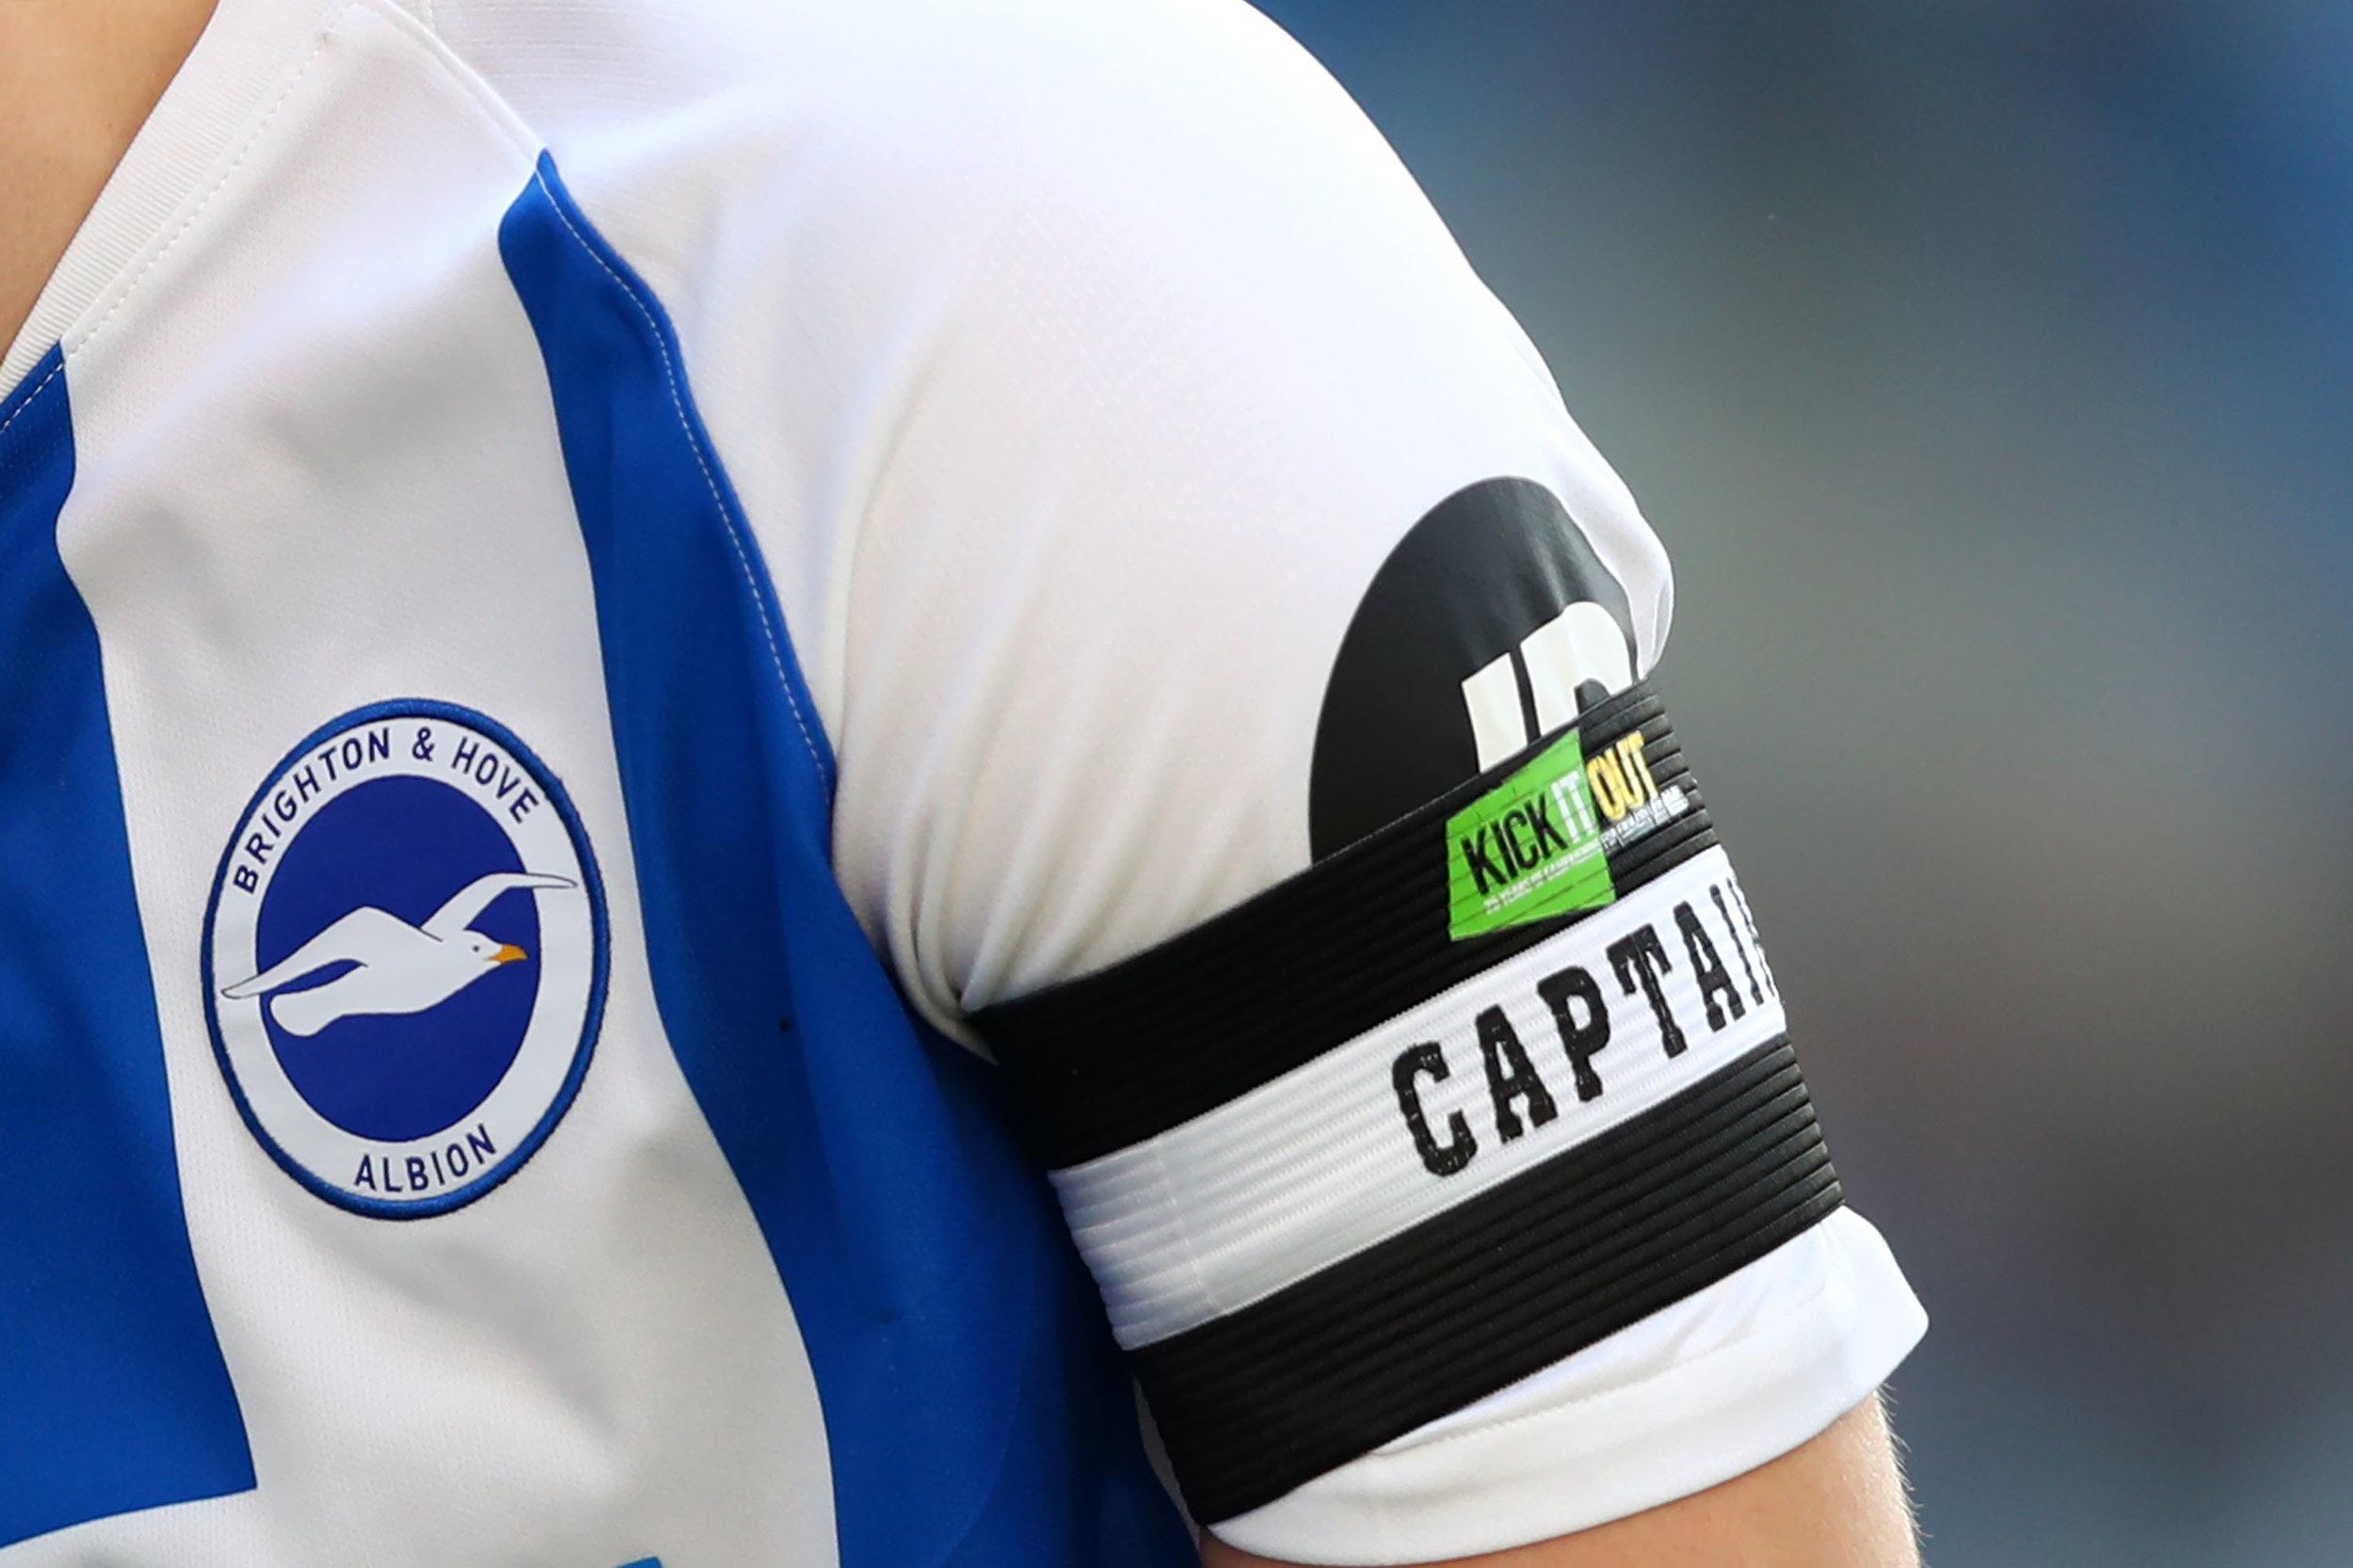 Brighton & Hove Albion Football Clubs karakteristiske logo. Foto: Dan Istitene/Getty Images